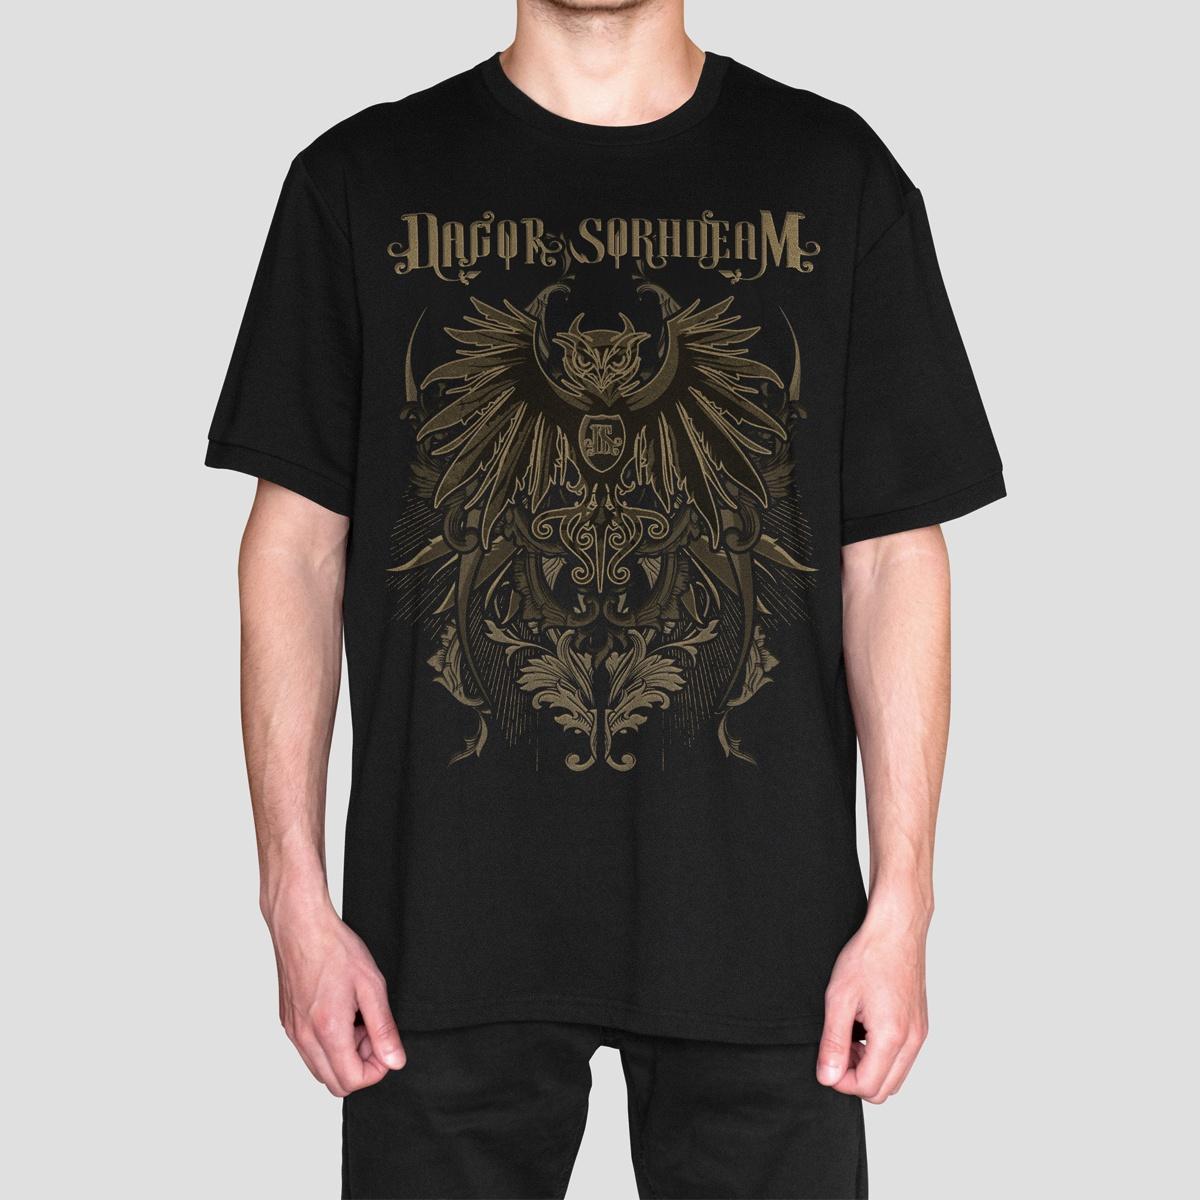 Camiseta Masculina Oficial - Banda Dagor